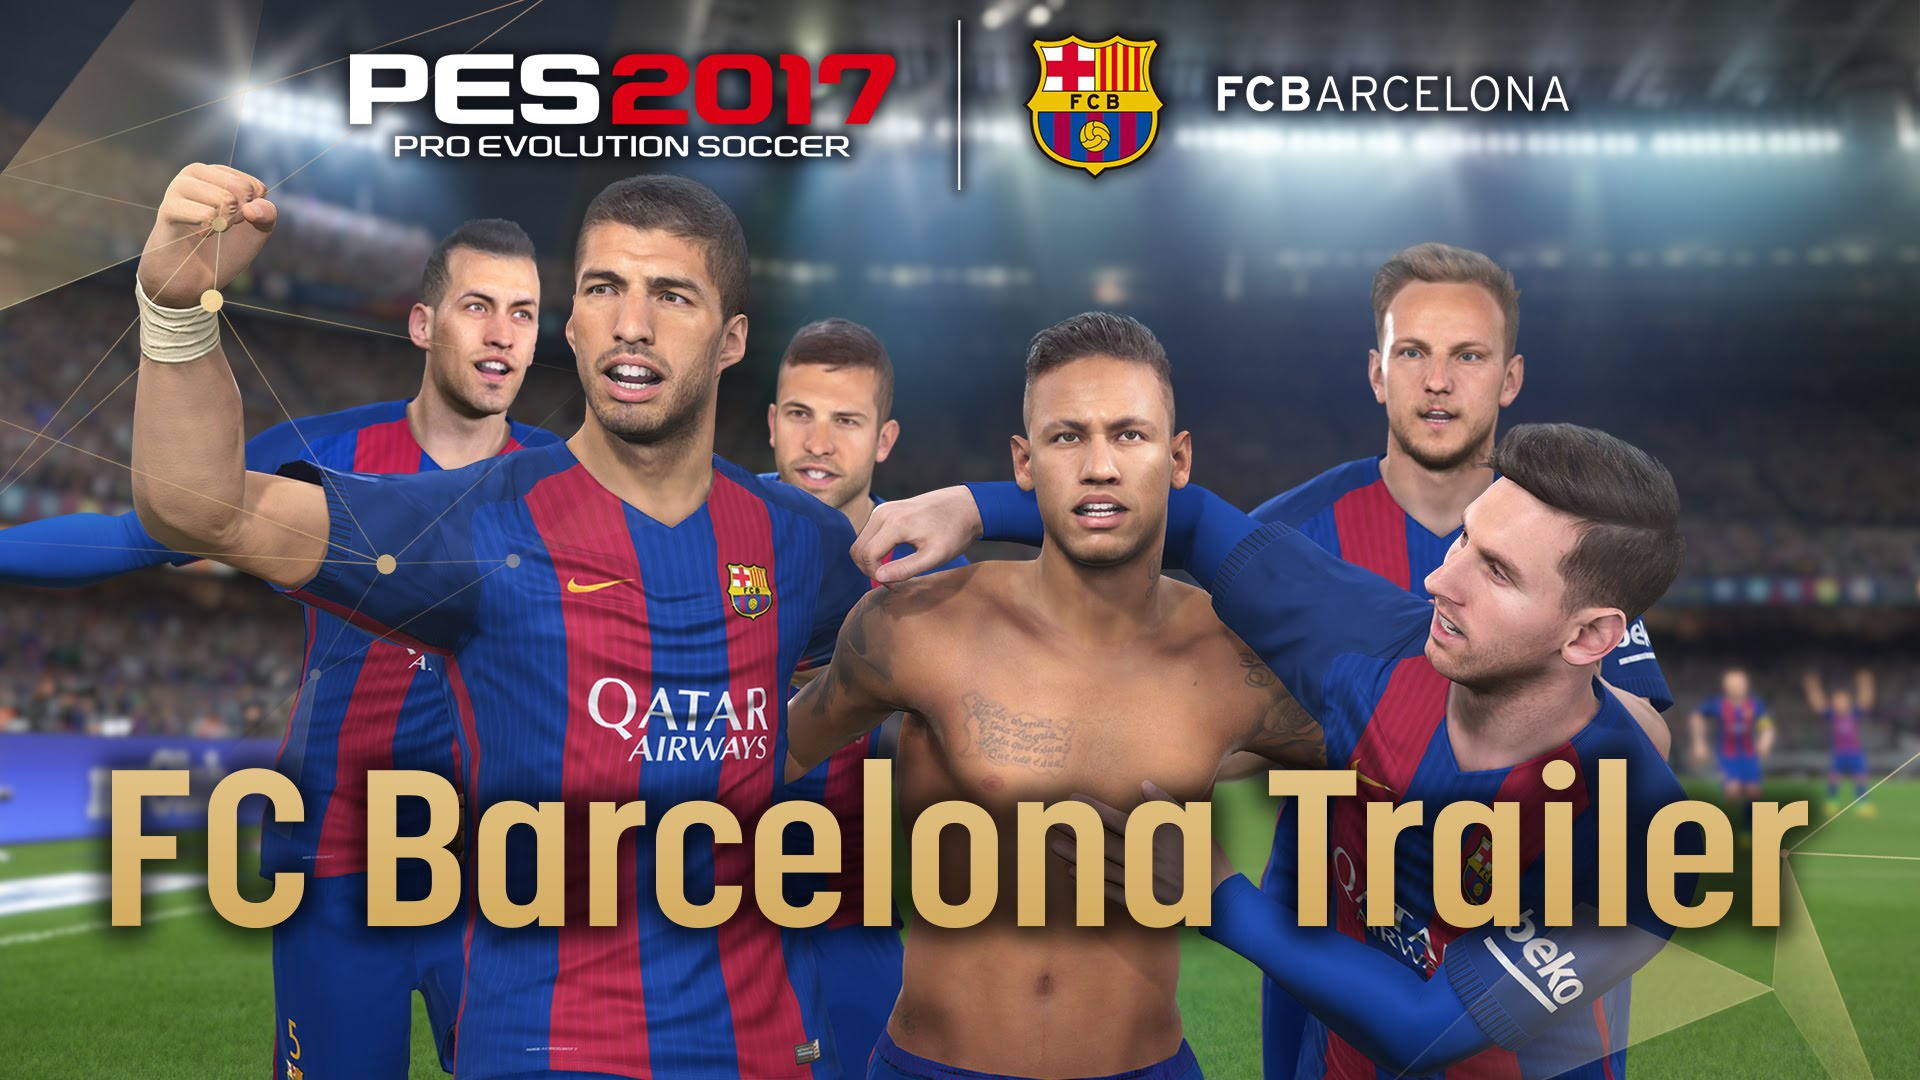 FC Barcelona w PES 2017